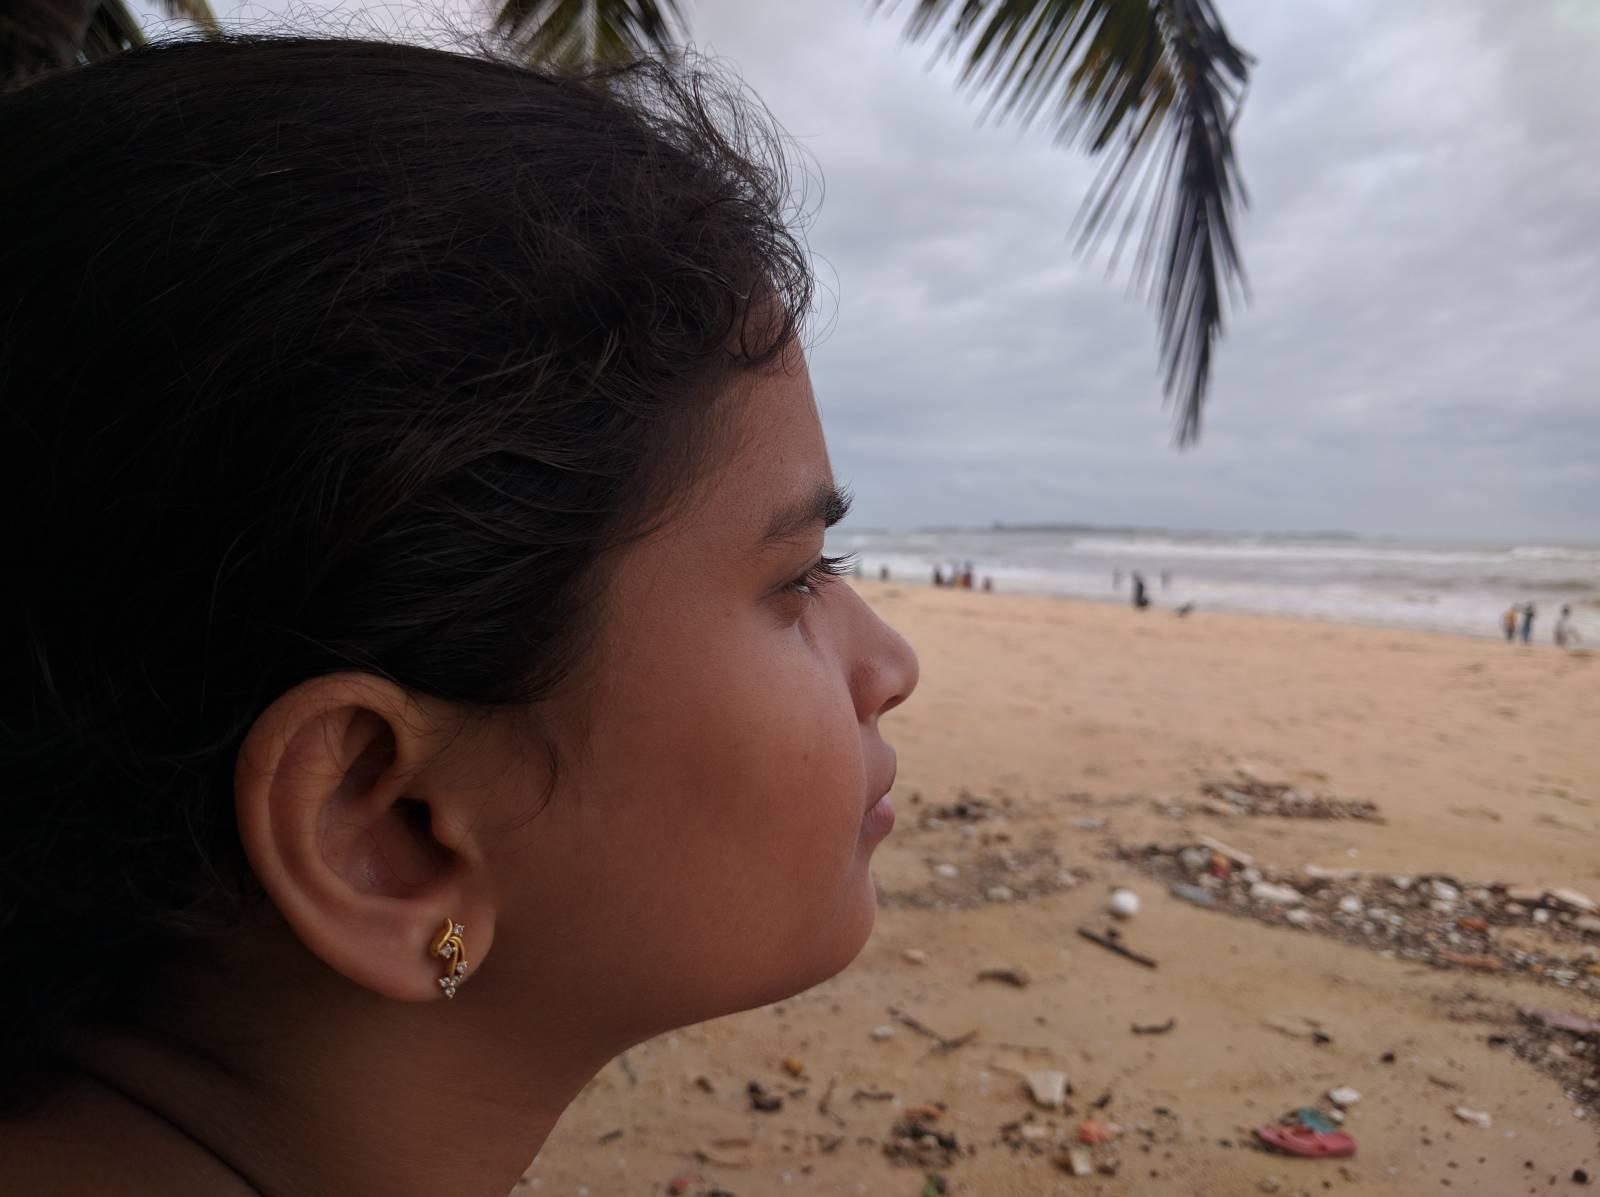 Jo looking into the sea